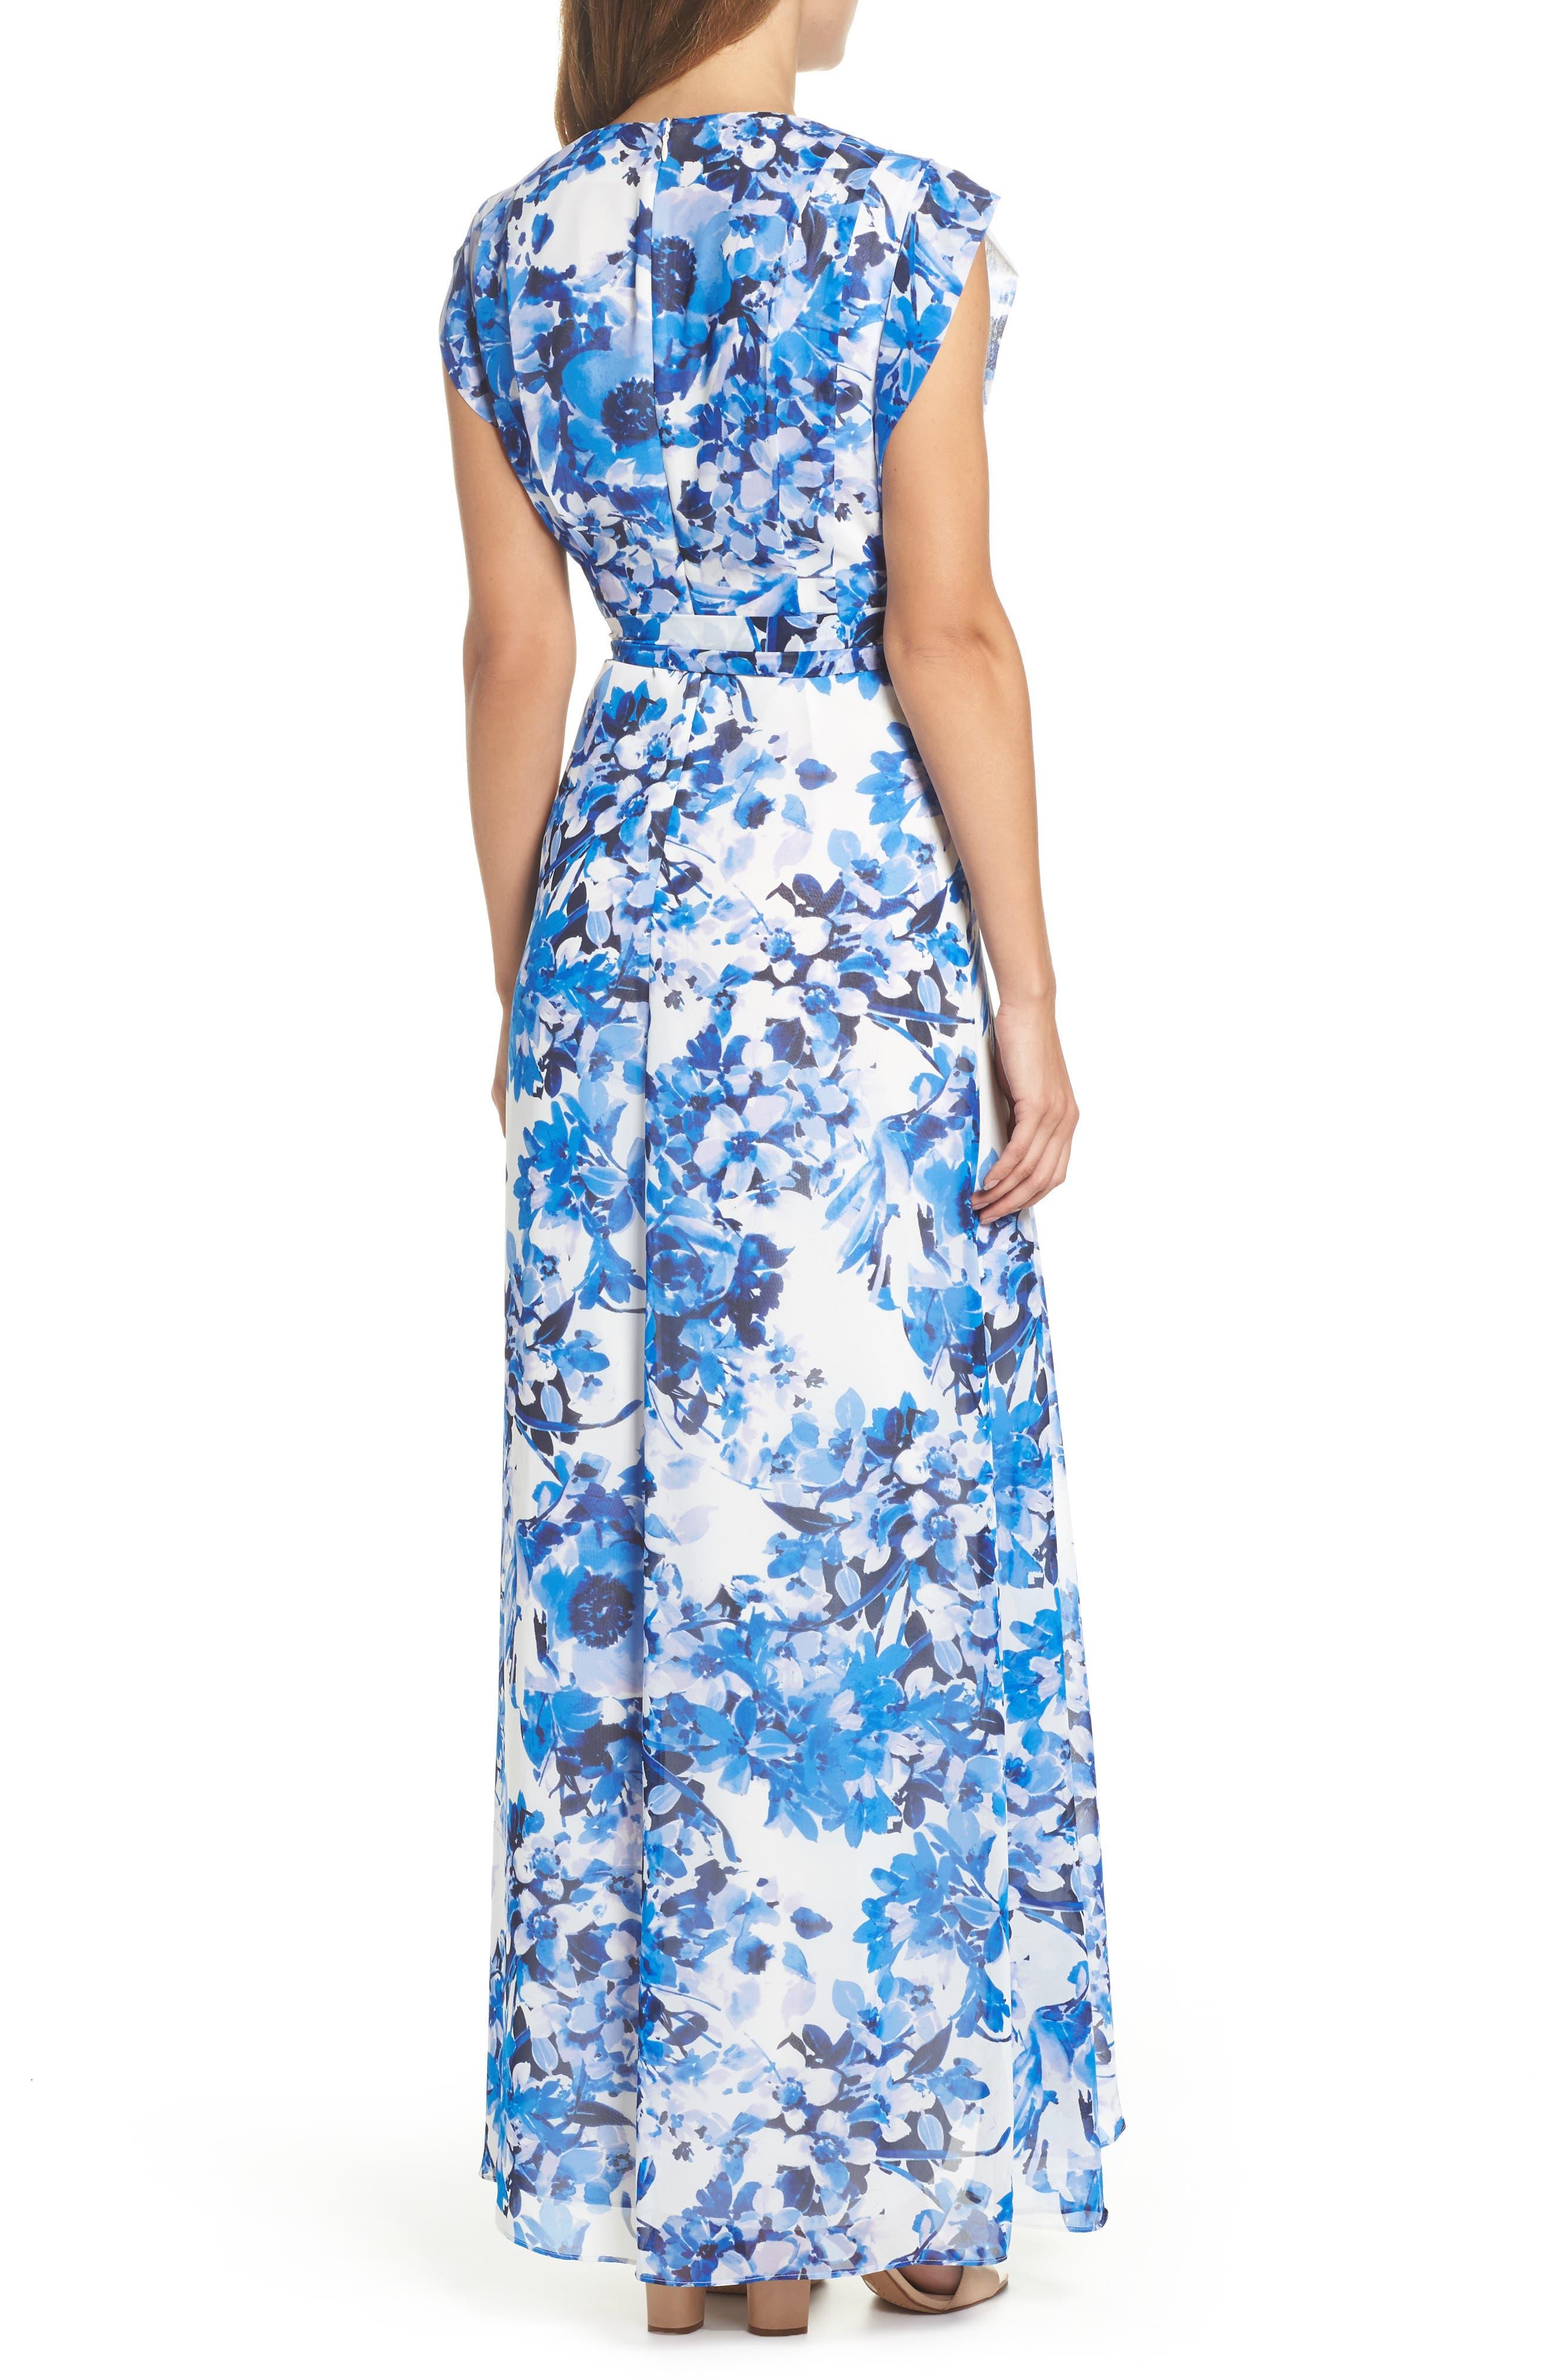 ELIZA J, Floral Ruffle High/Low Maxi Dress, Alternate thumbnail 2, color, BLUE